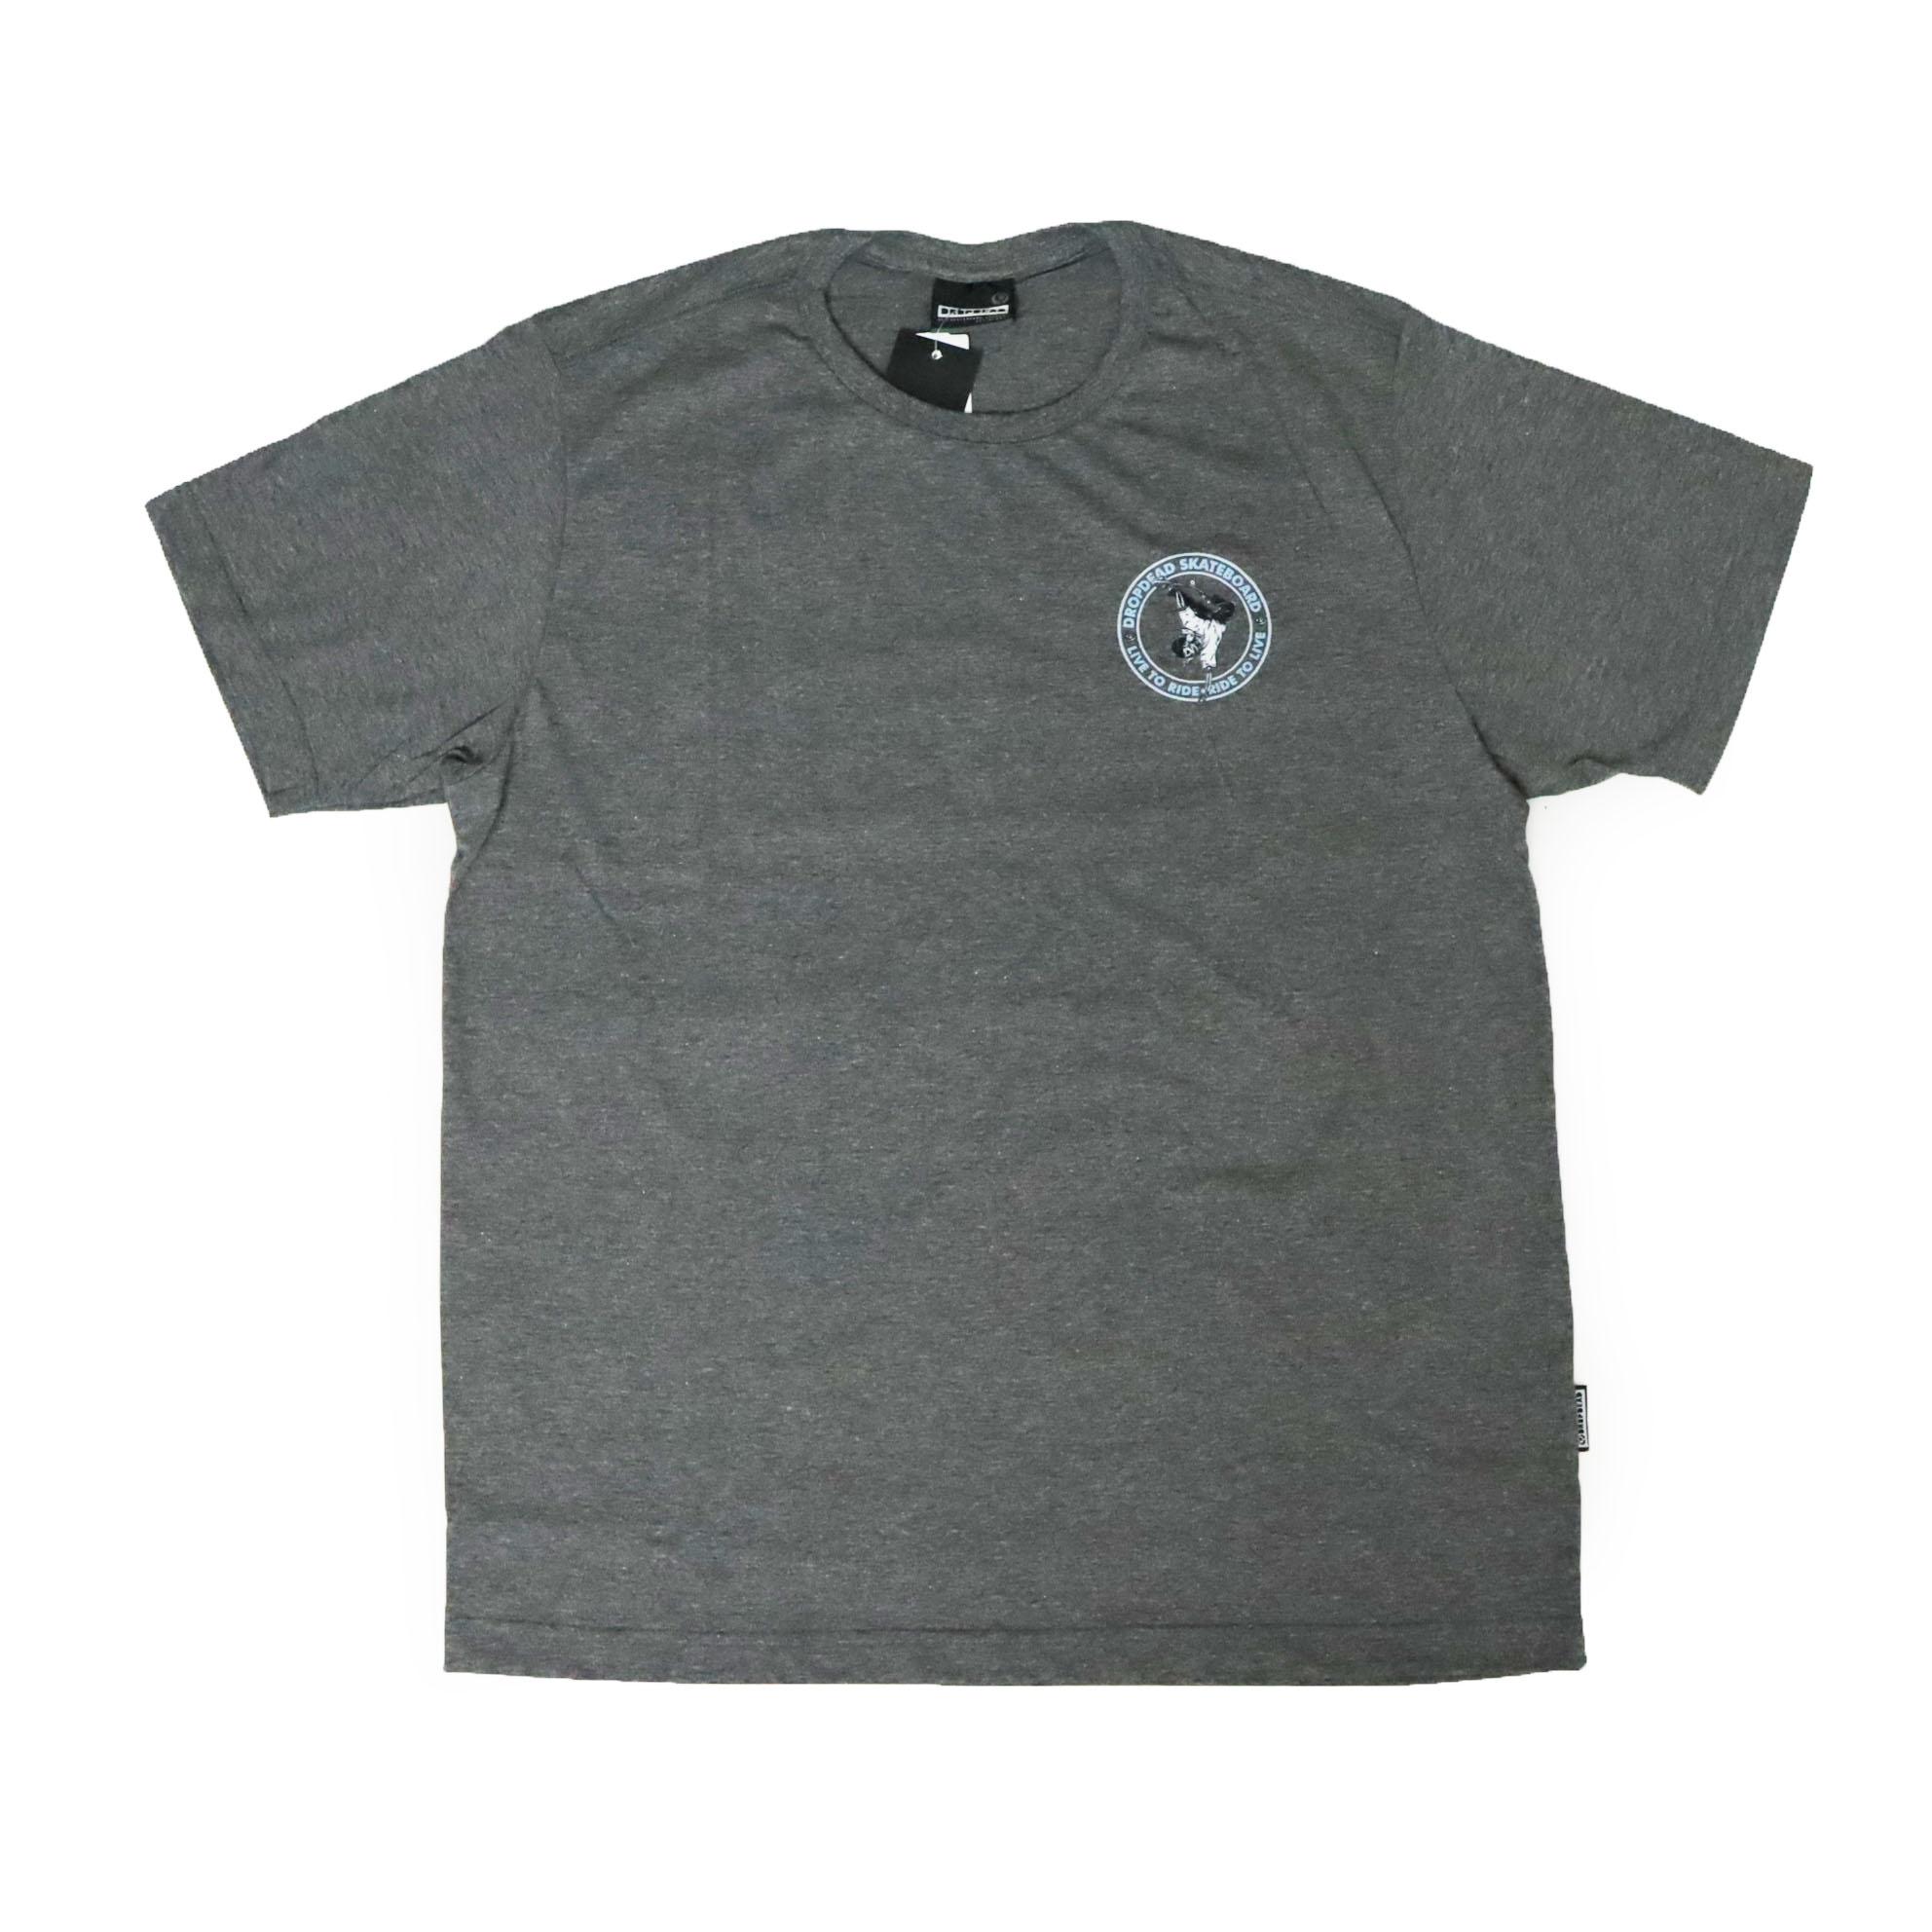 Camiseta Drop Dead Ride To Live - Chumbo Mescla